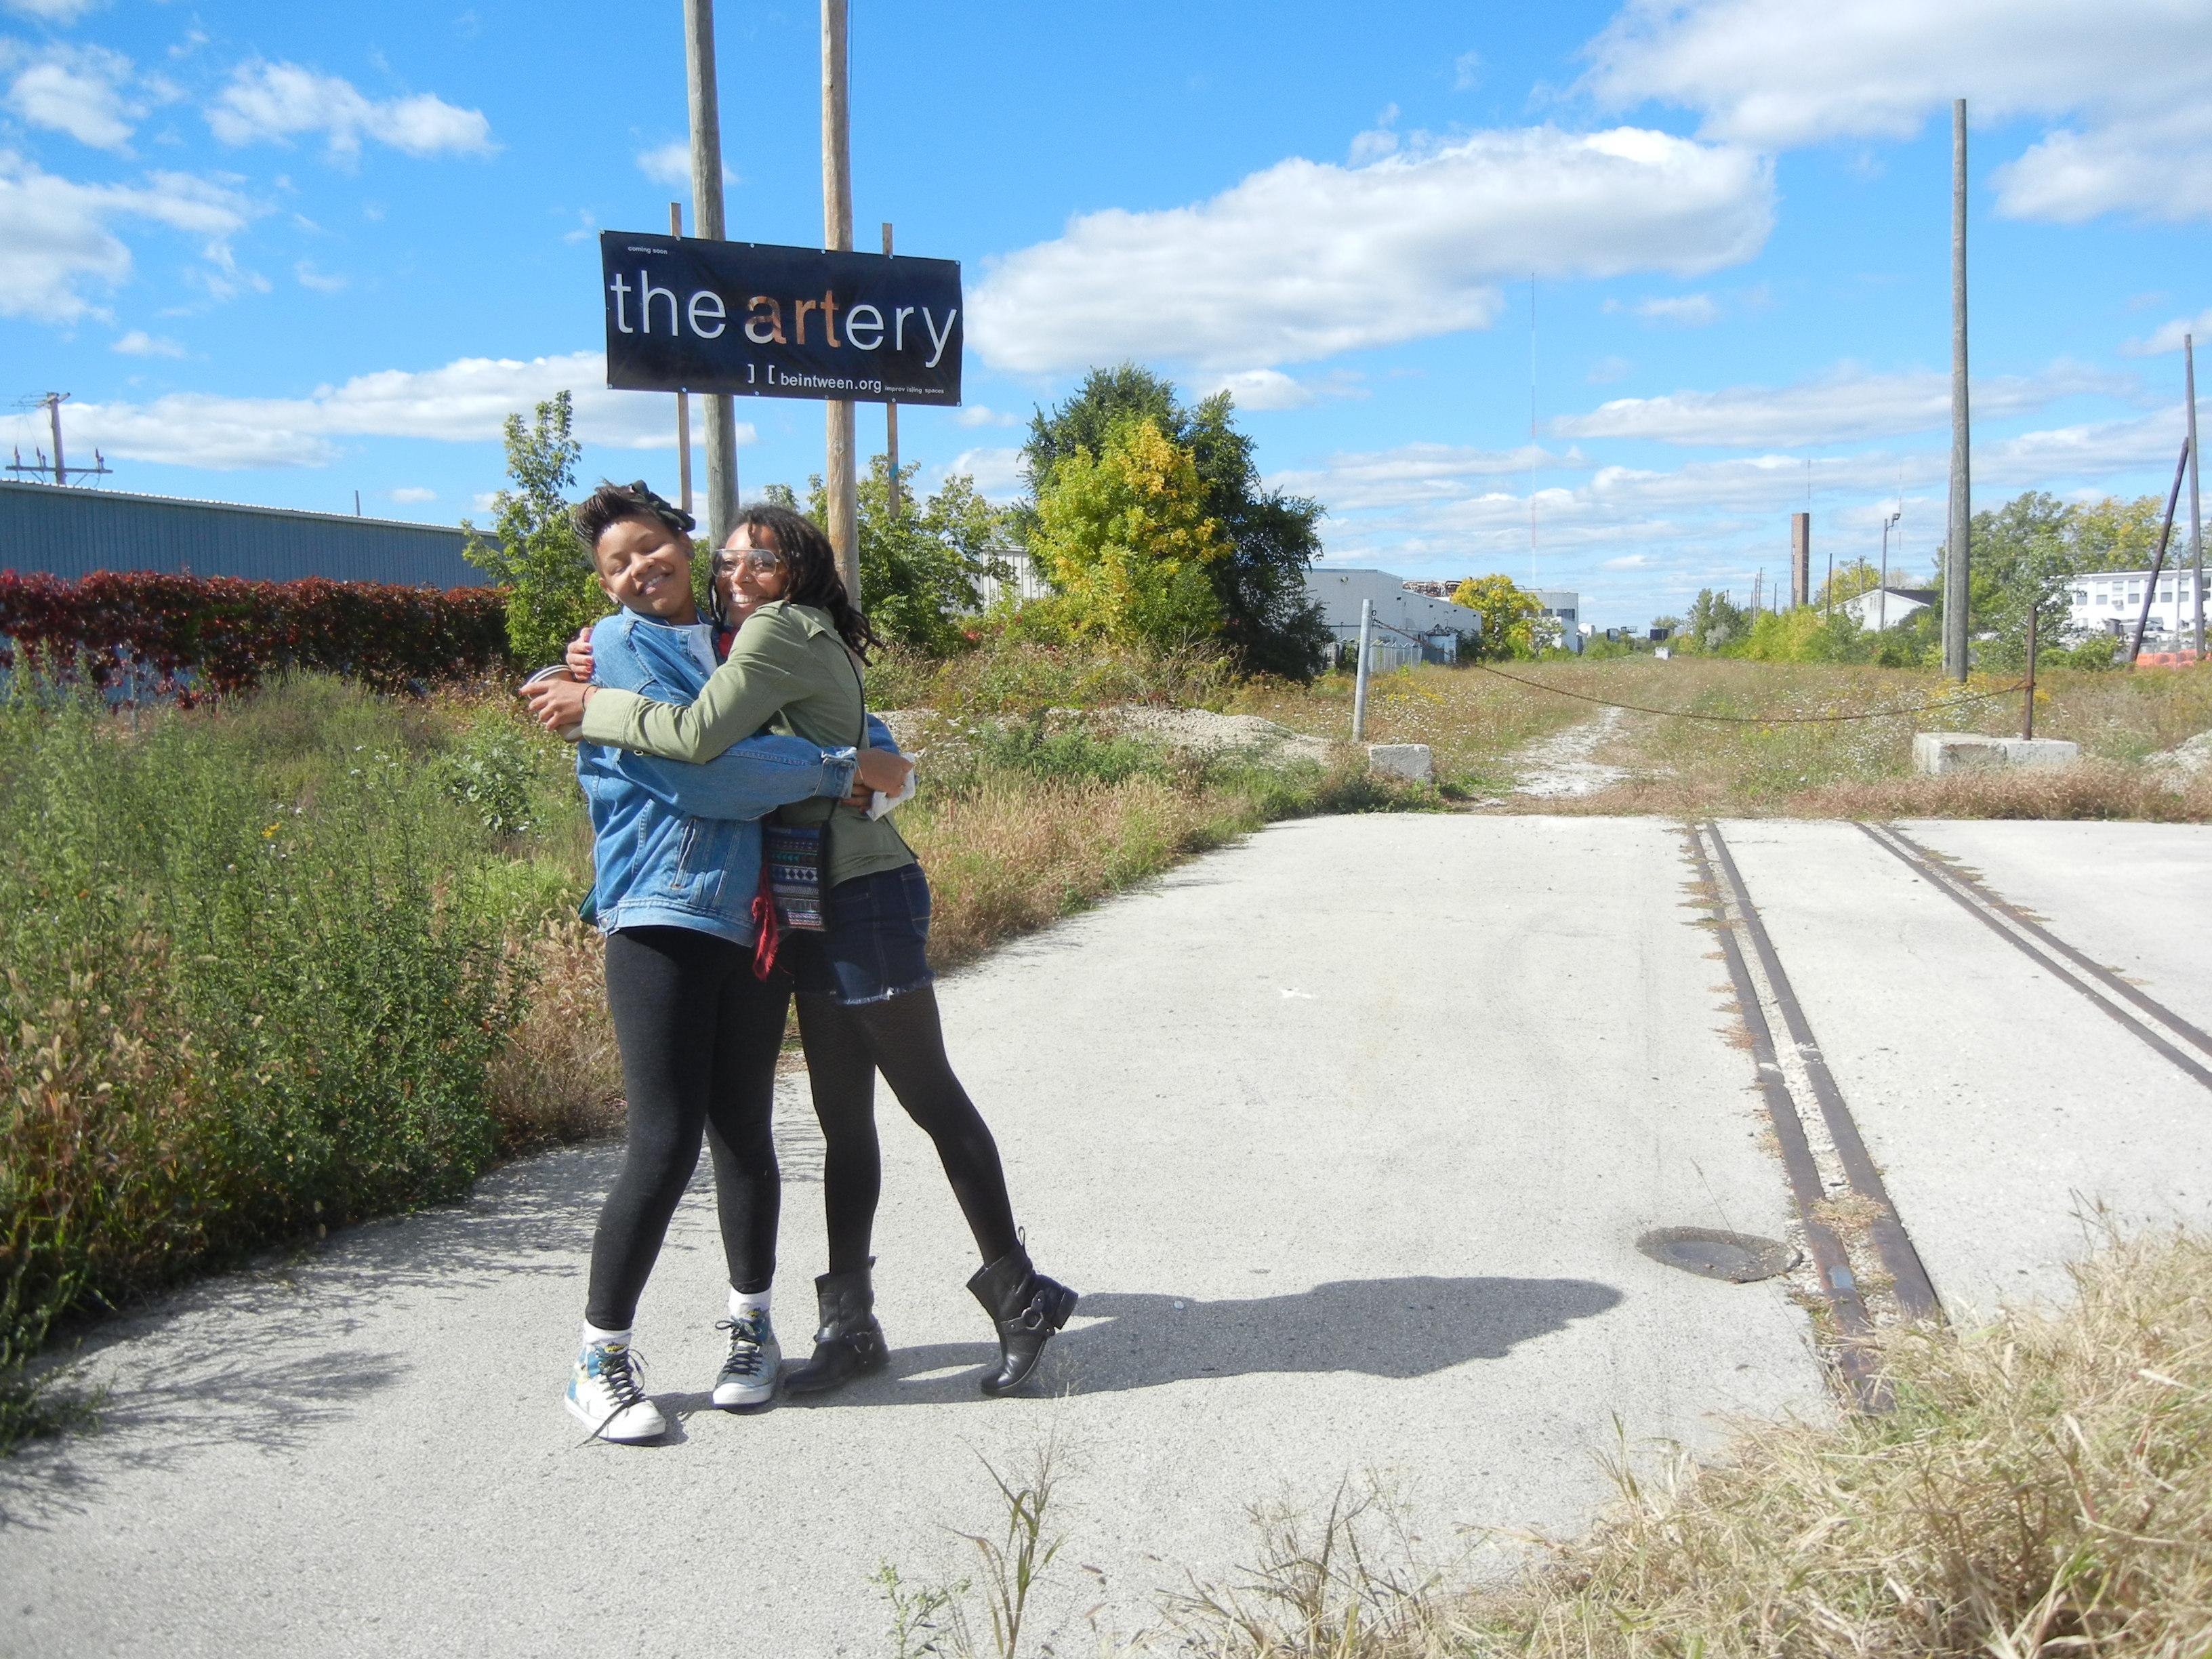 the-artery-girls-hug